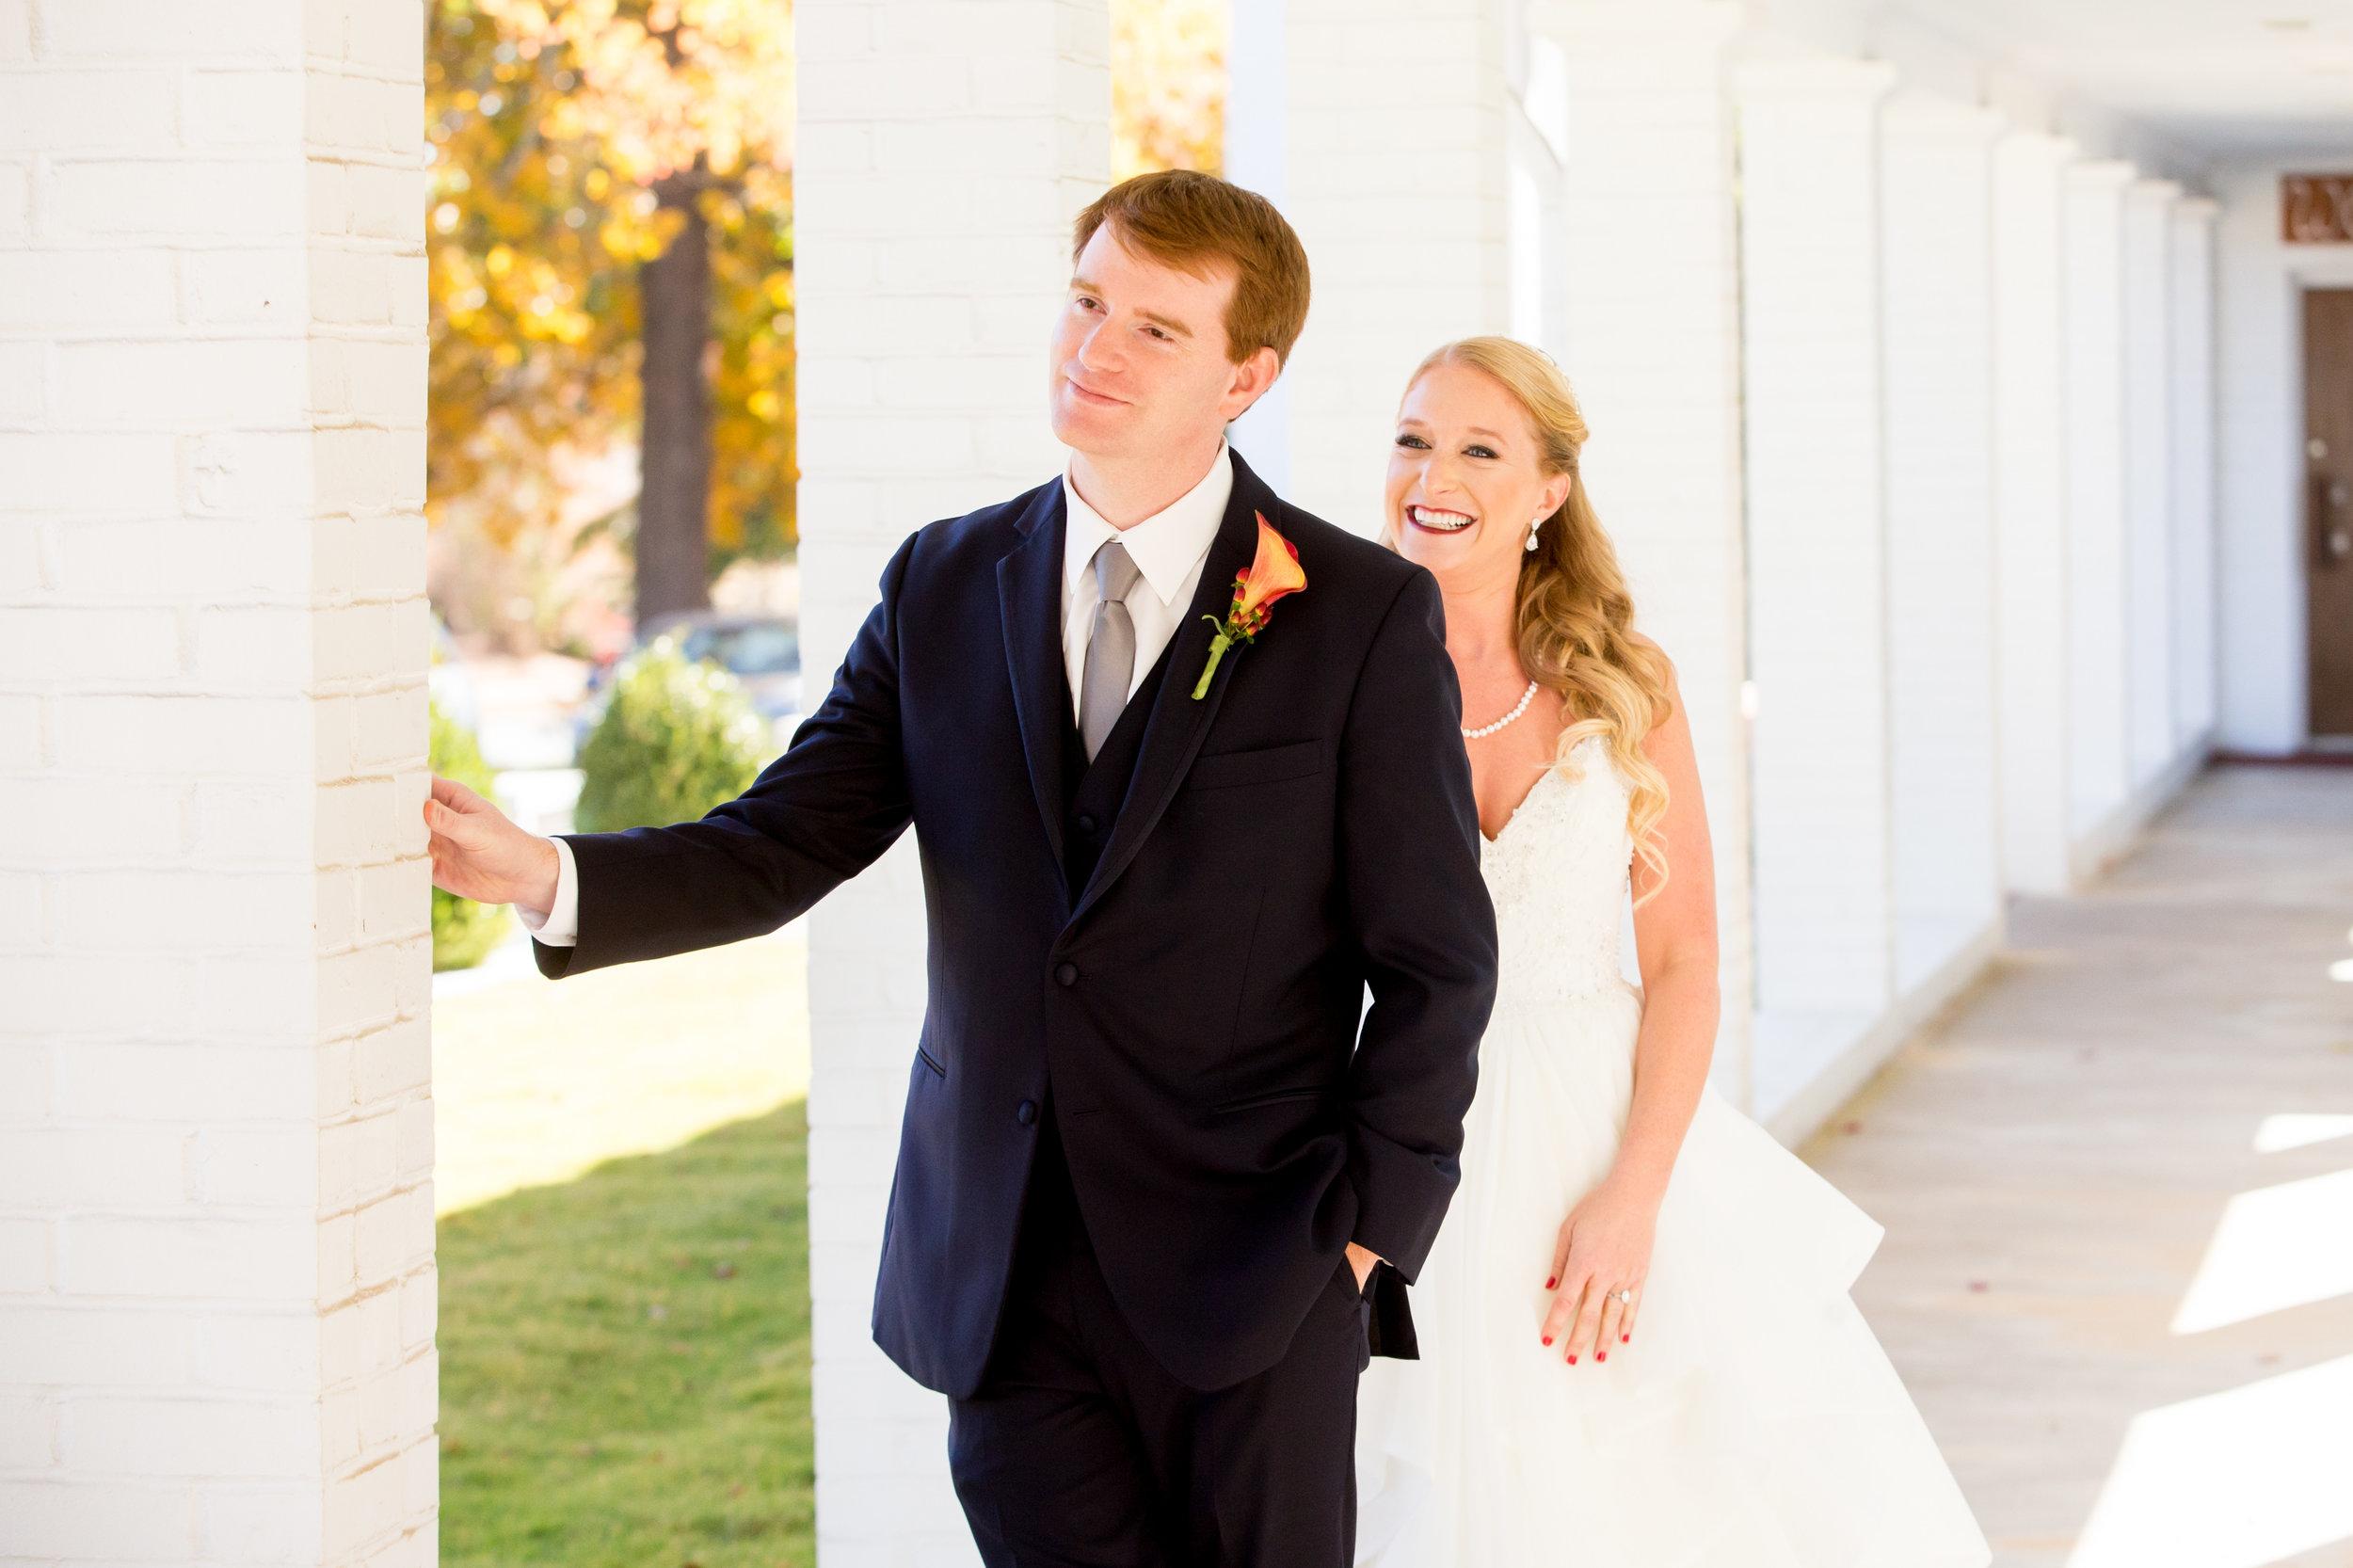 Andrew&Emma_Wedding-128.jpg